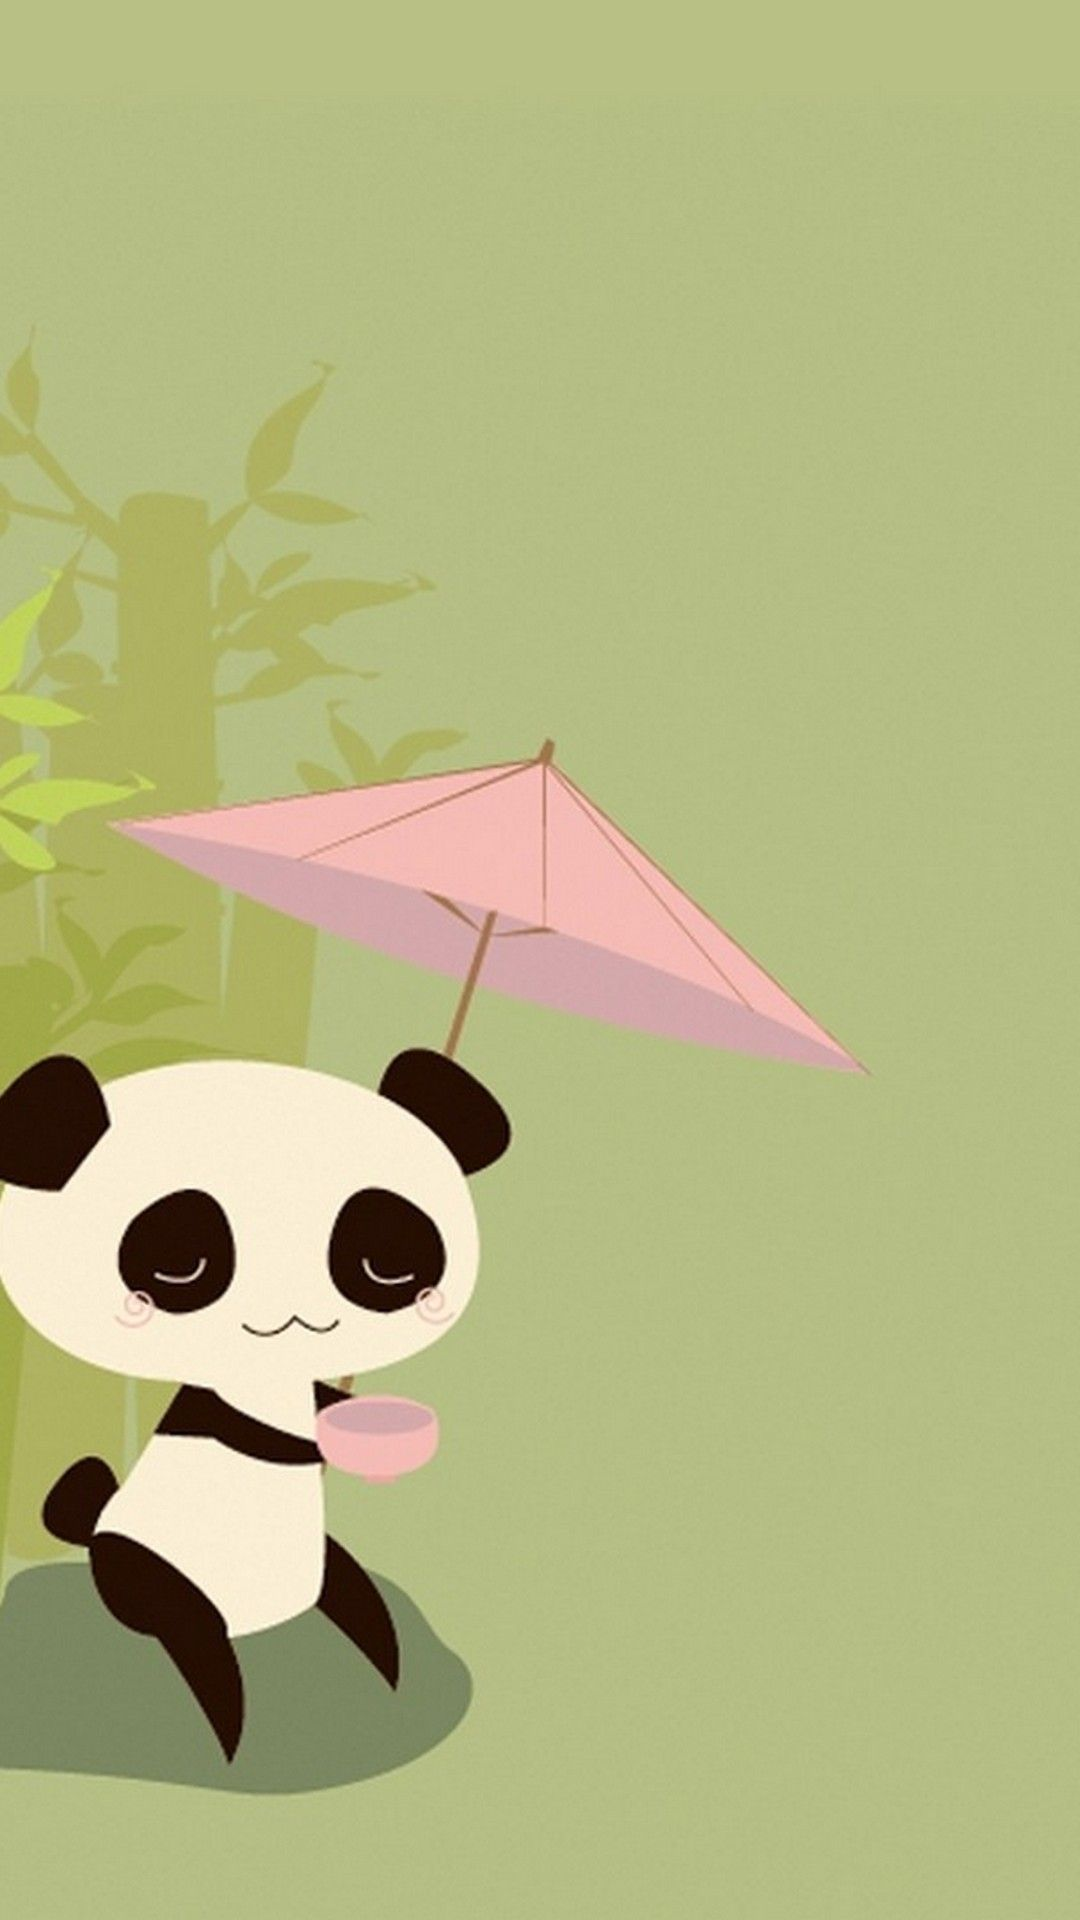 Panda Wallpaper Ios Panda Wallpapers Snowman Wallpaper Android Wallpaper